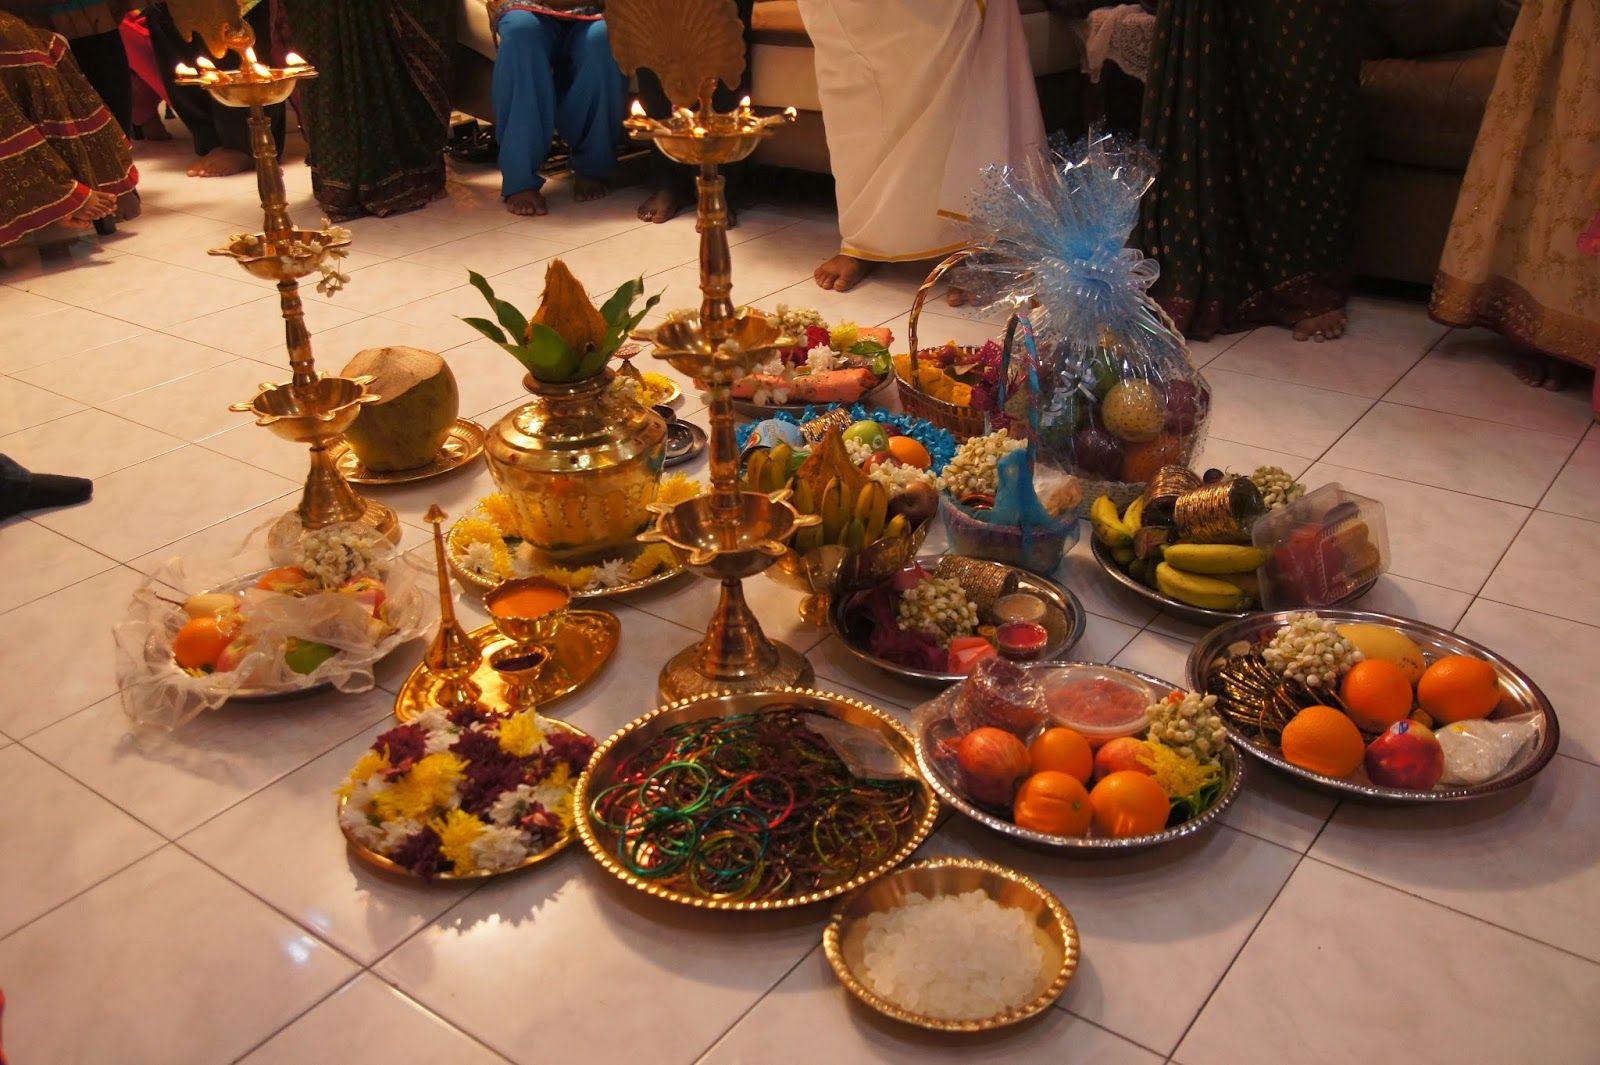 Our lil bundle of joy valaikappu aka bangle ceremony for Baby tray decoration